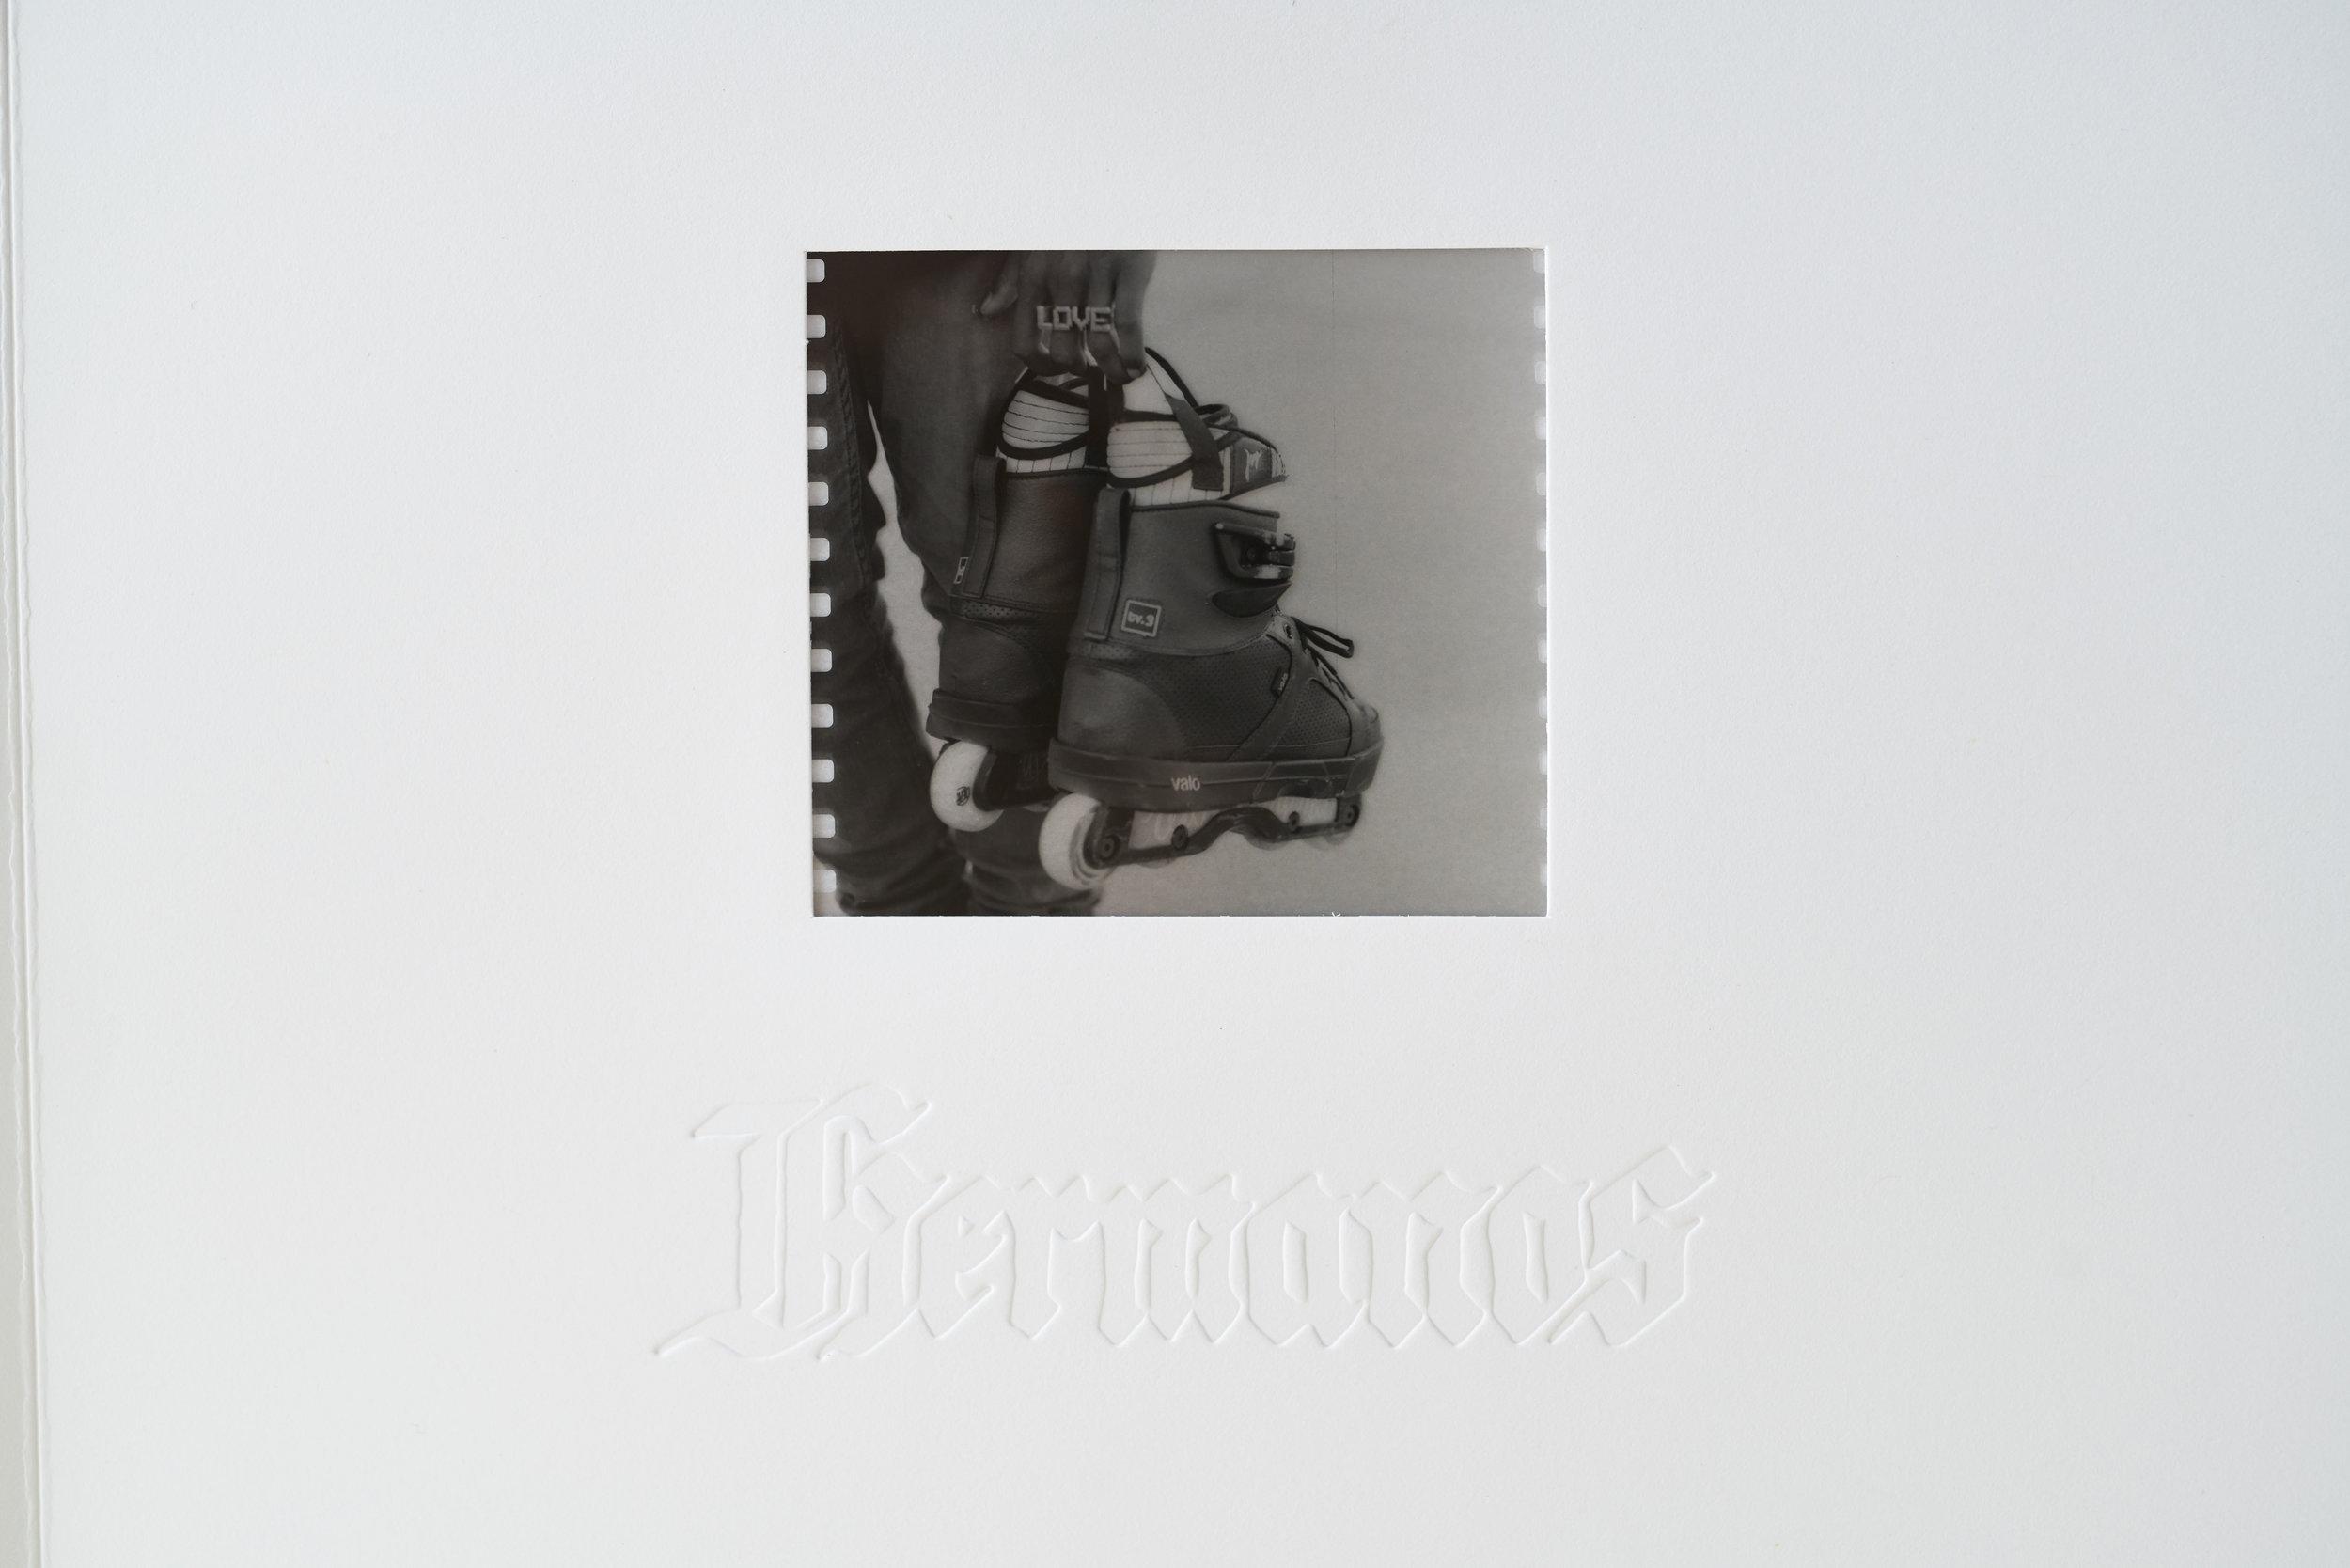 11.6.17_Hermanos_Books2708.jpg